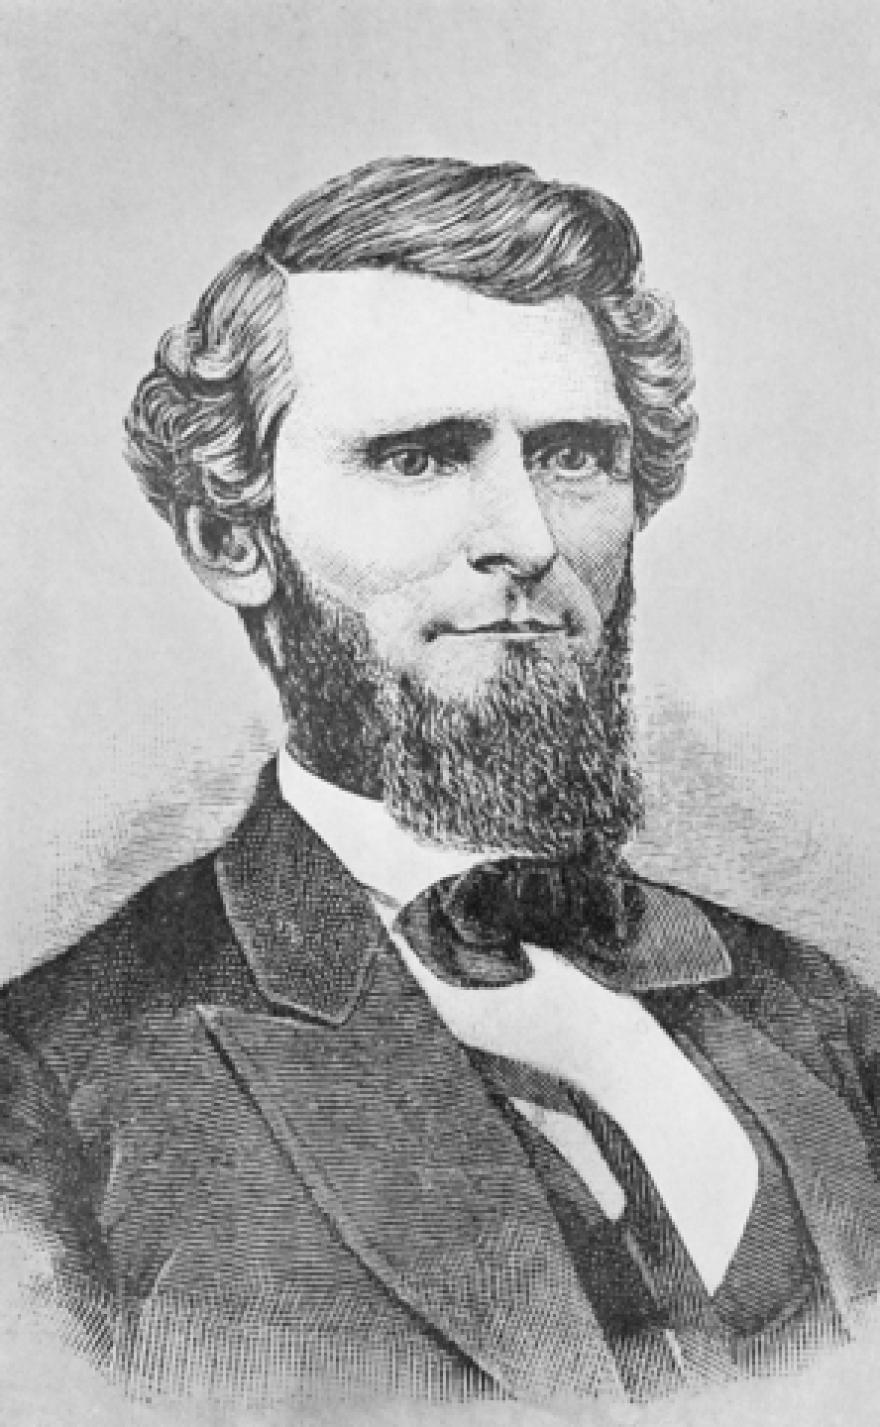 Governor Arthur Ingraham Boreman (1823-96)